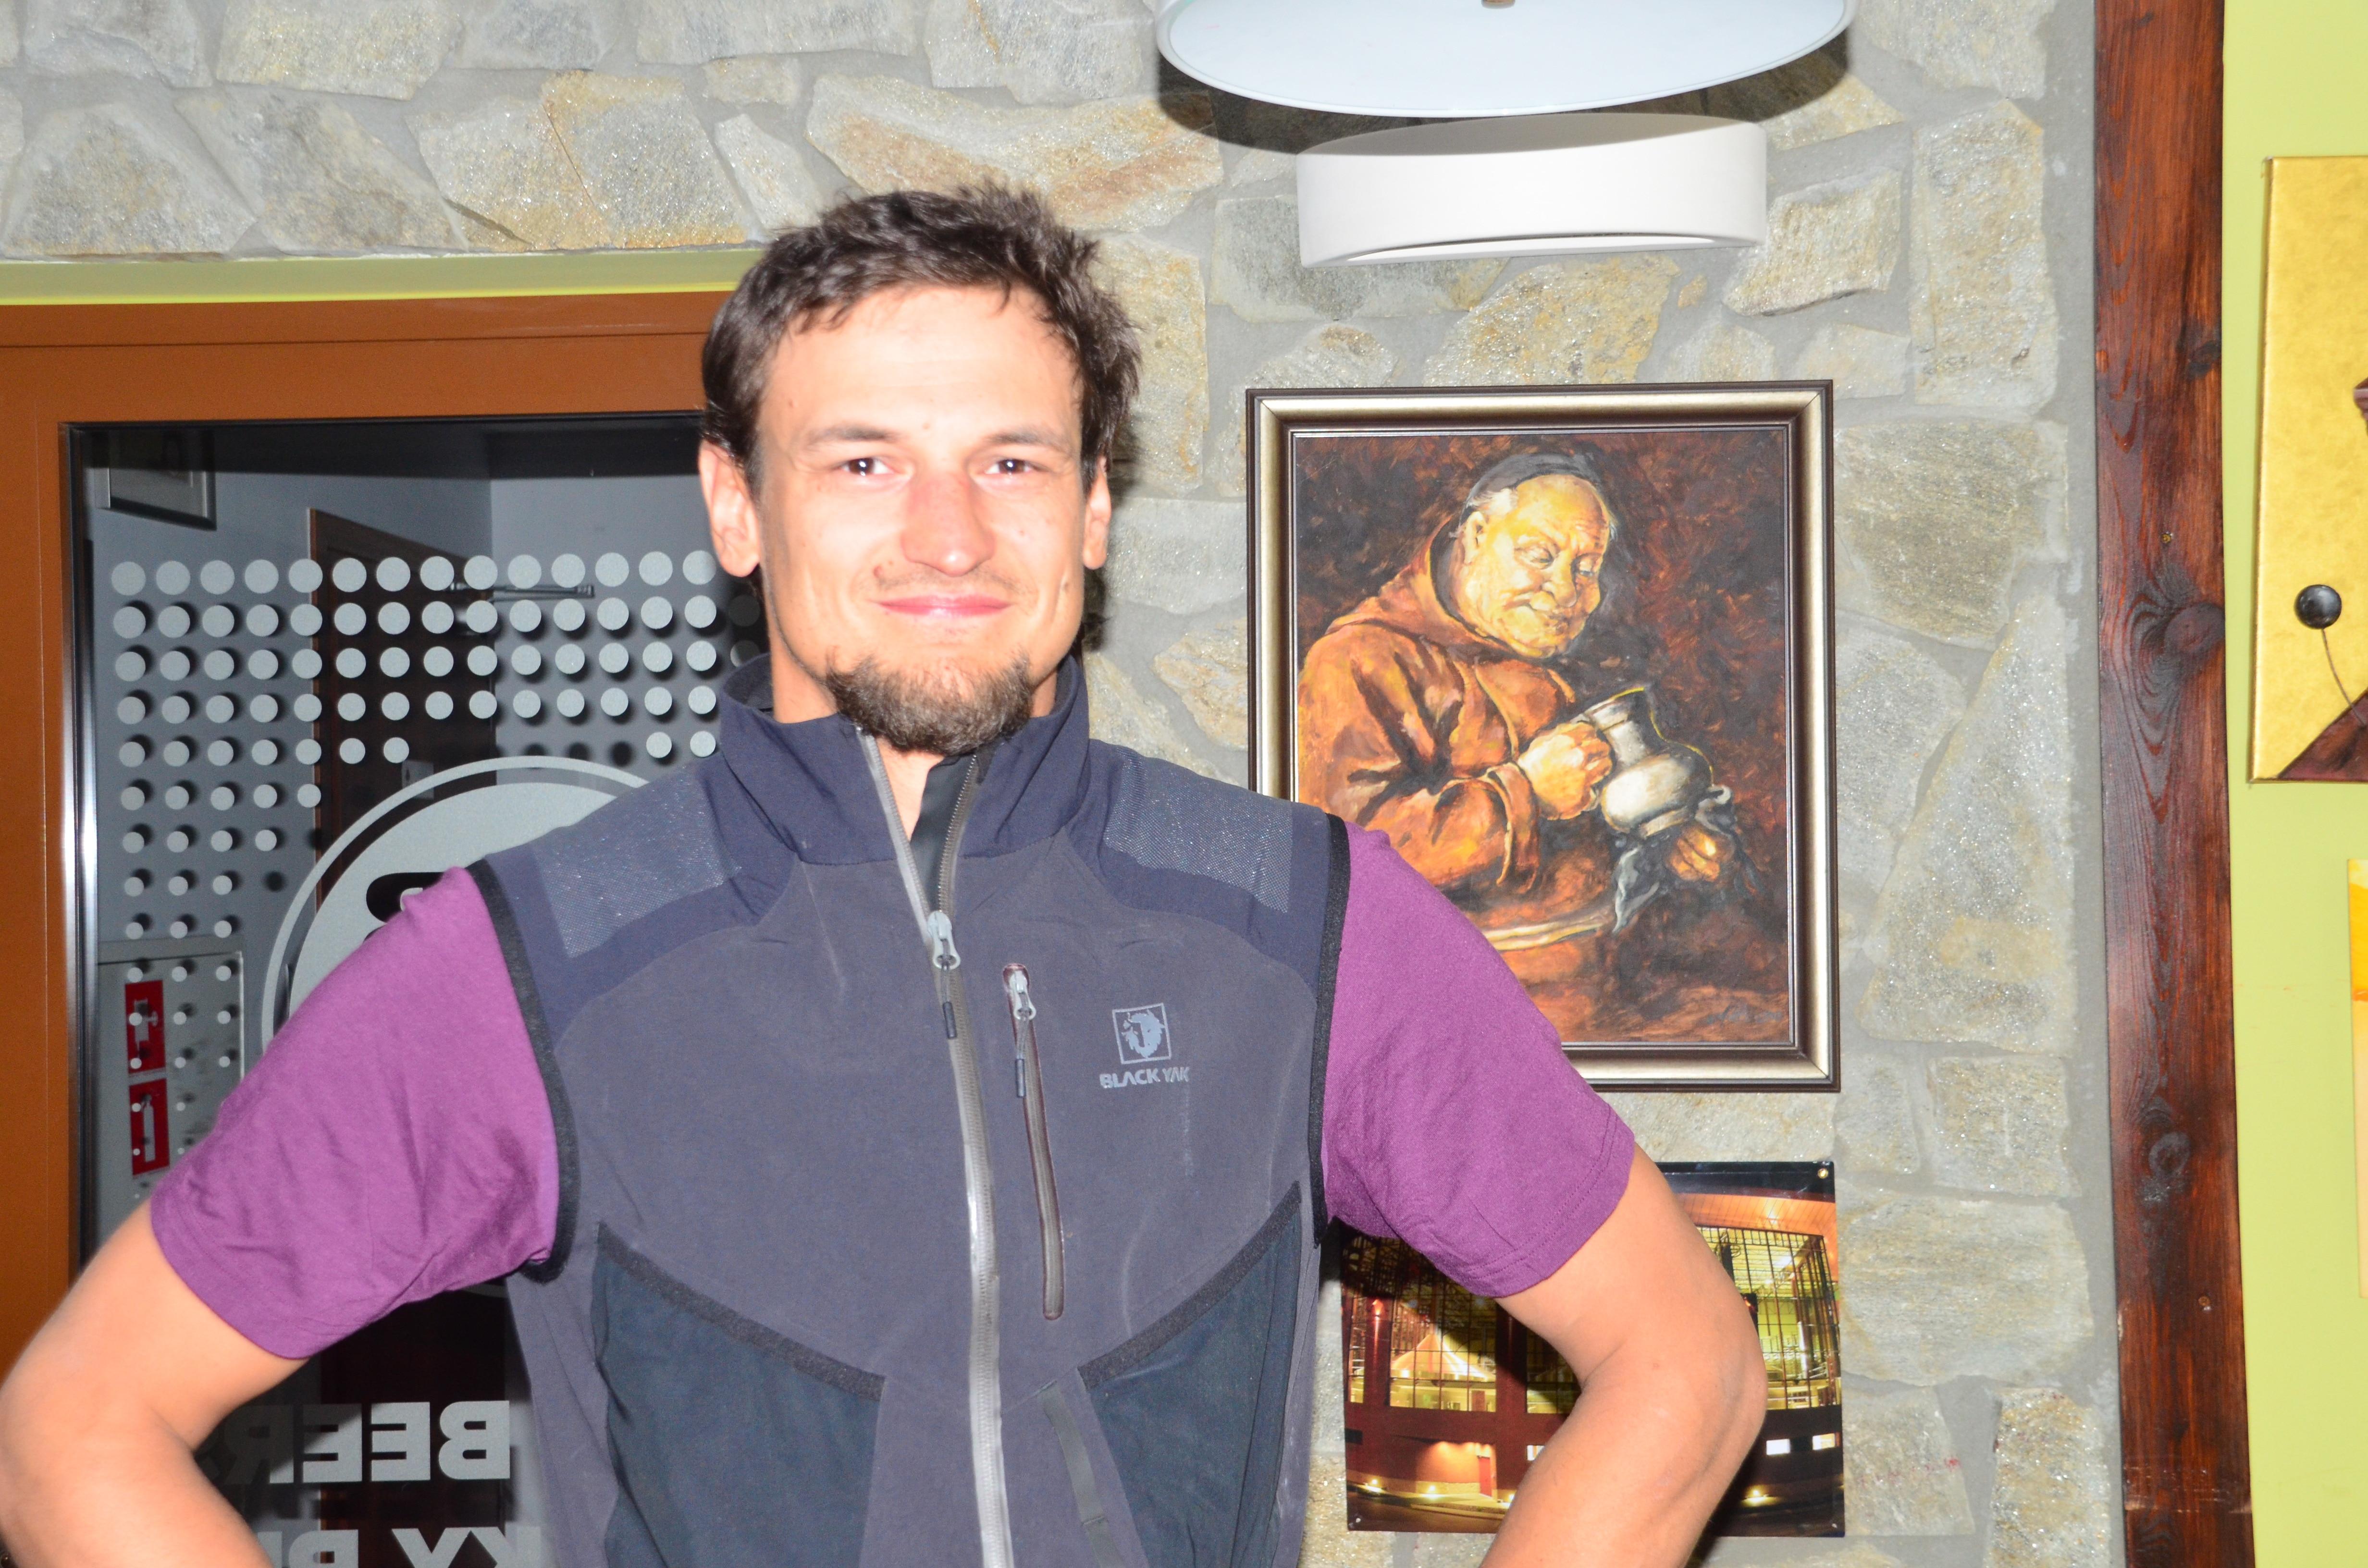 Adam Bielecki, K2, Nanga Parbat